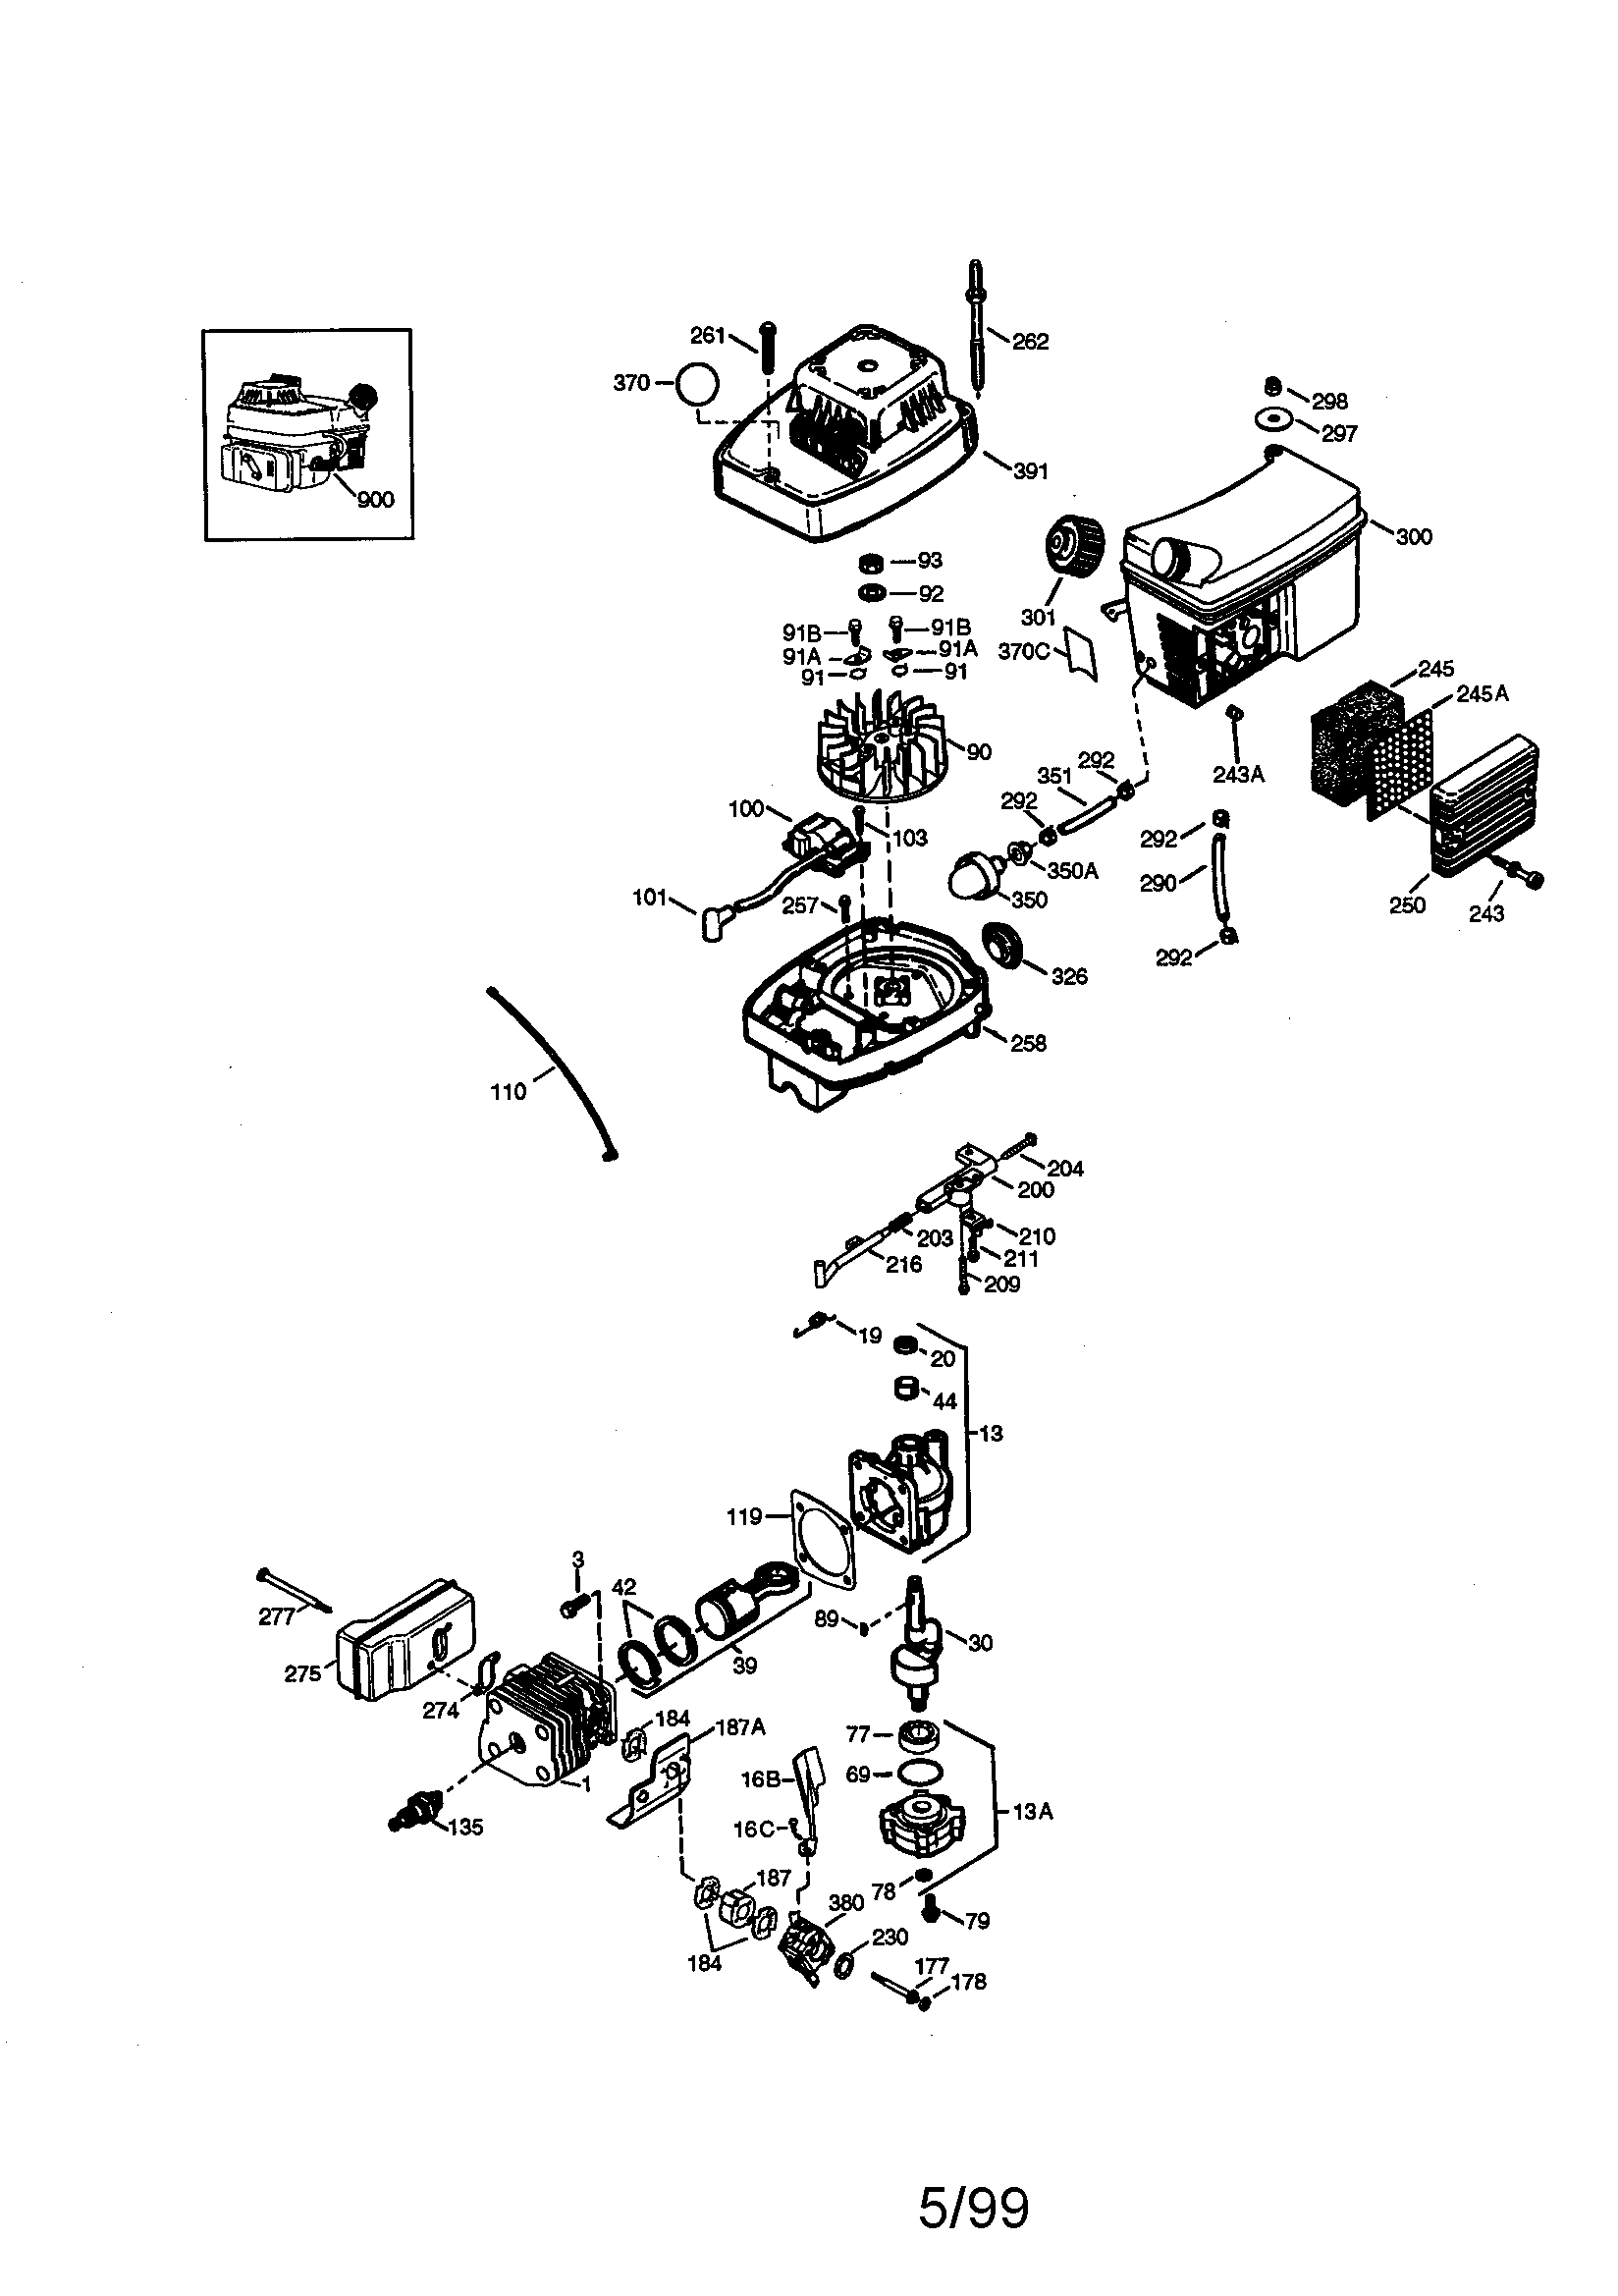 Pleasant Tecumseh Engines Carburetor On Shoppinder Wiring Cloud Loplapiotaidewilluminateatxorg